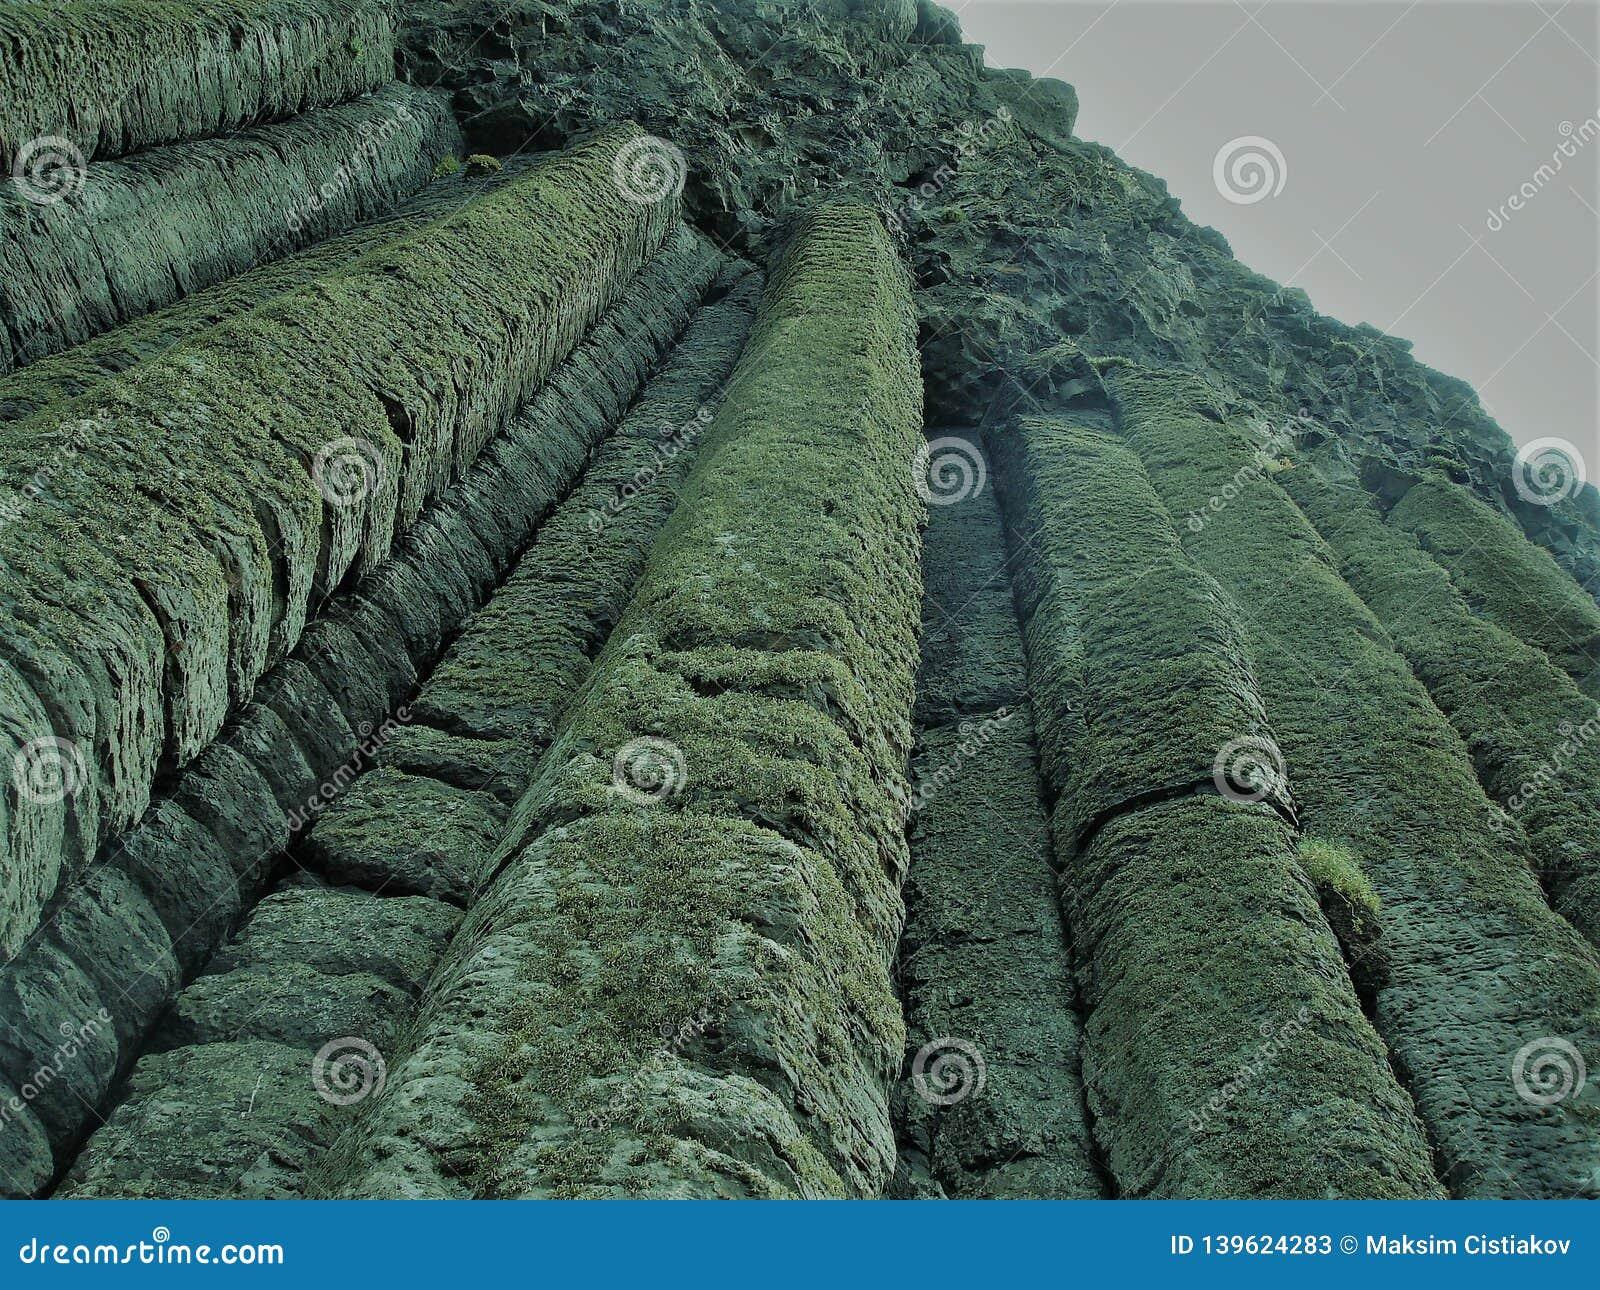 Kolumny skały przy giganta drogim na grobli